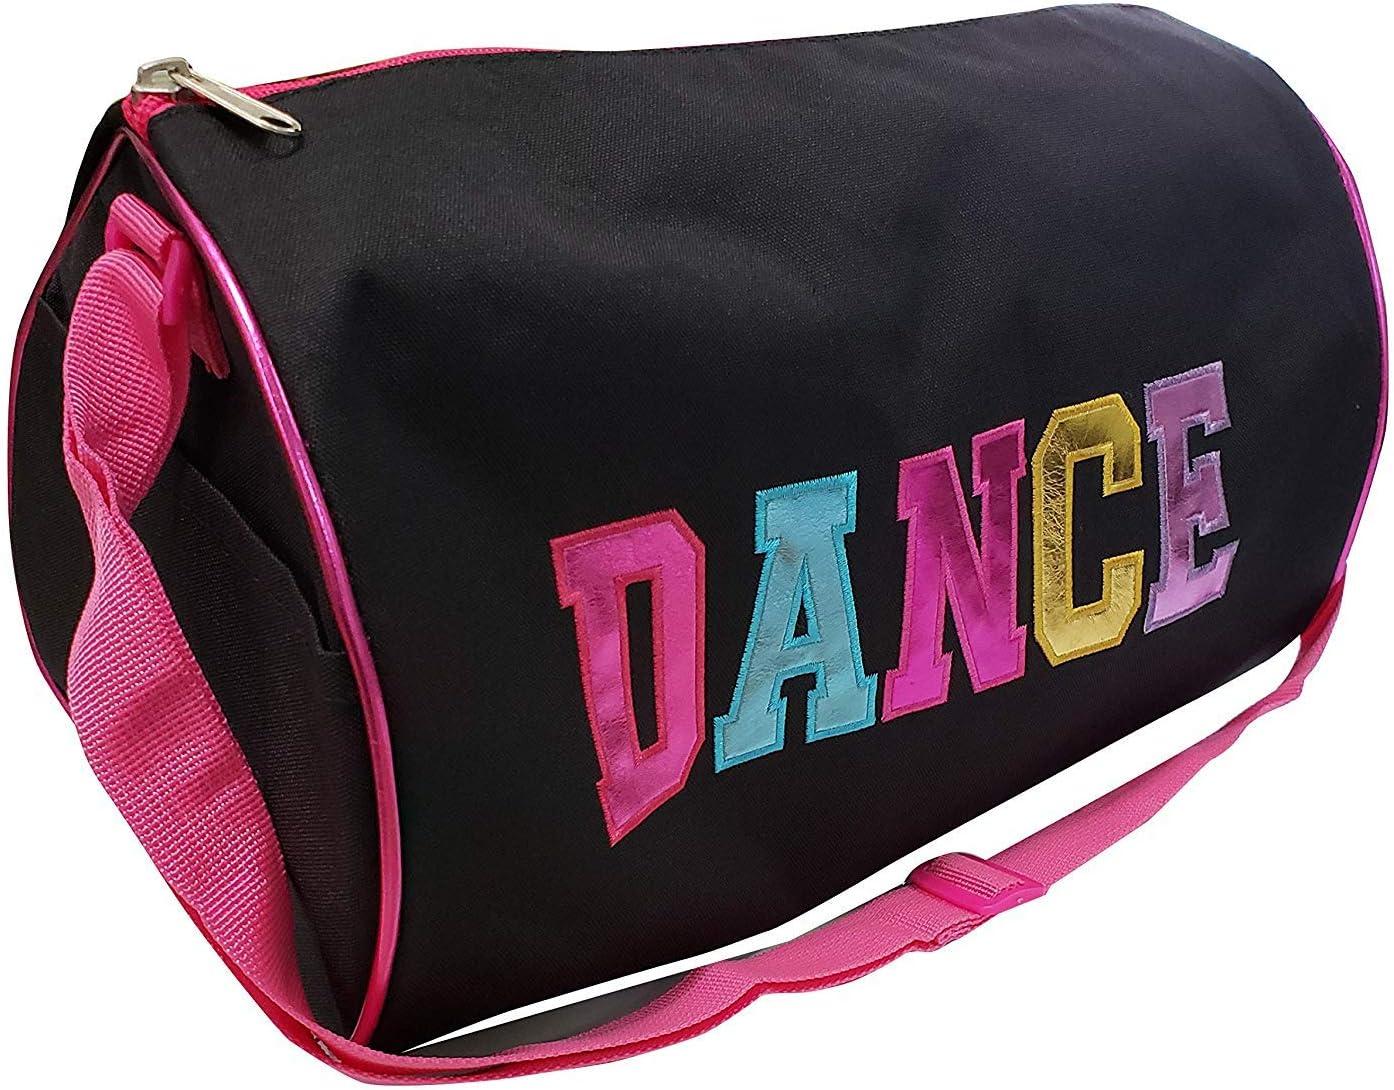 BLACK Dance Duffel Bag with Multicolored Dance Print